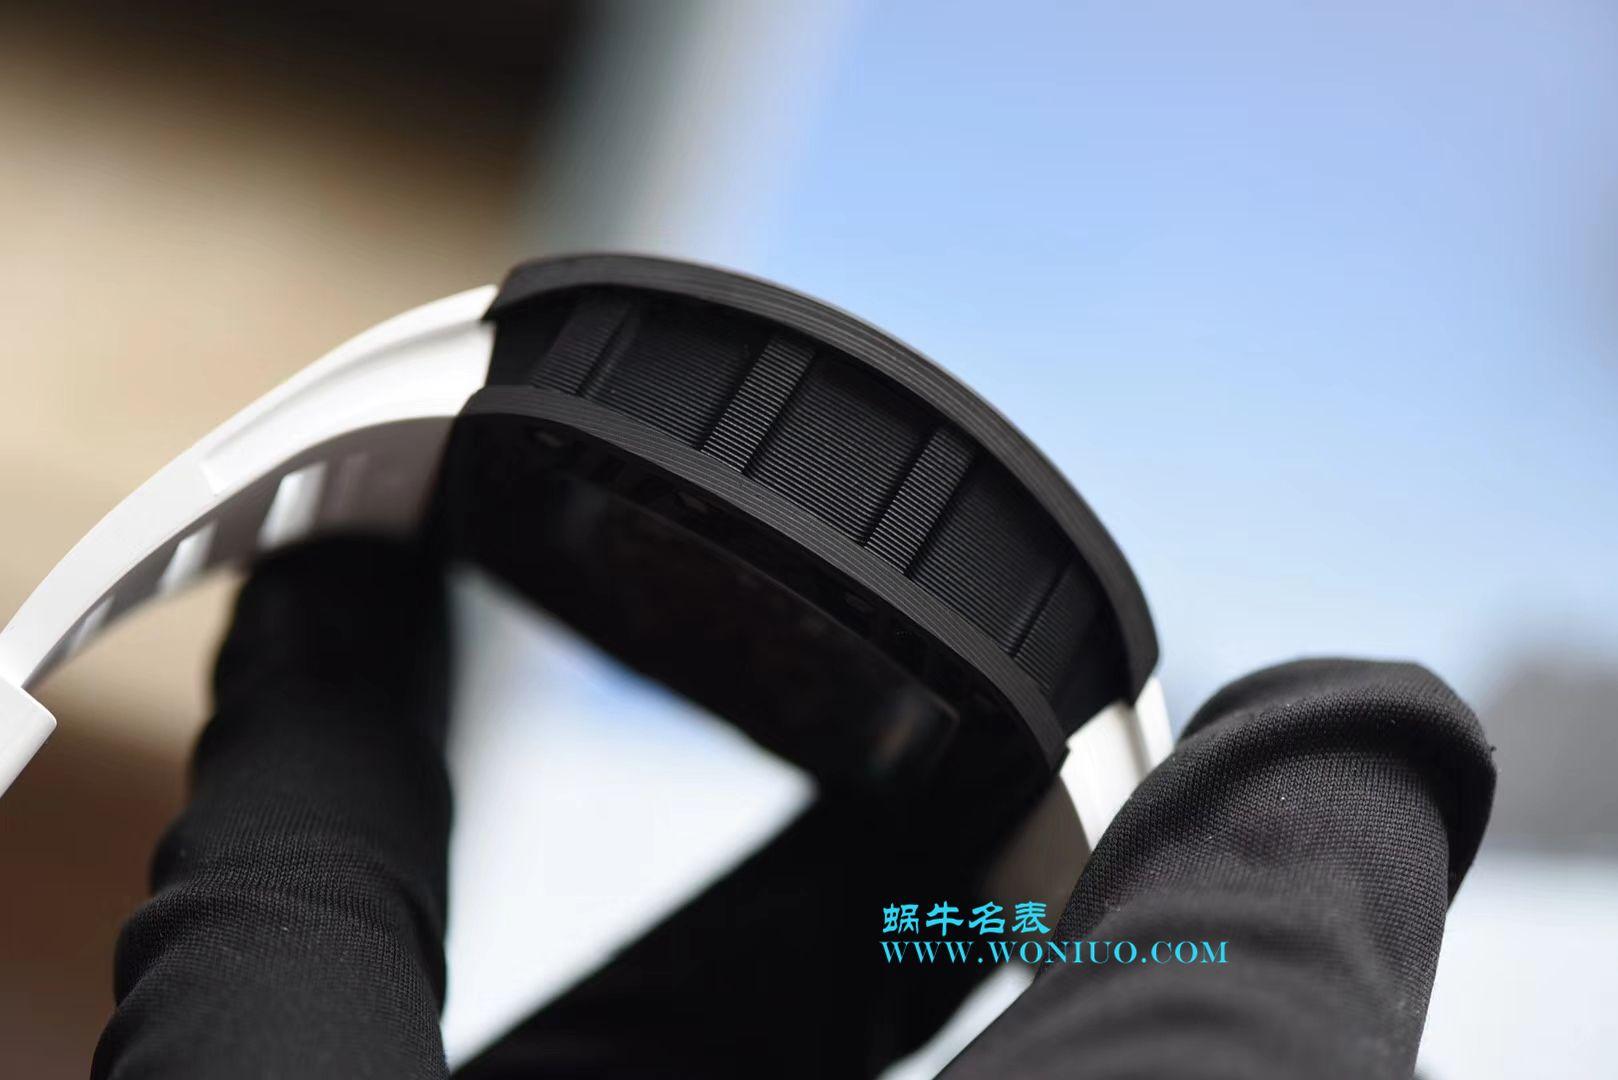 【KV一比一超A高仿手表】理查德米尔RICHARDMILLE 最强版RM055巴巴沃森.蒂芙尼蓝阿布扎比赛道特别纪念版 / RM 055G